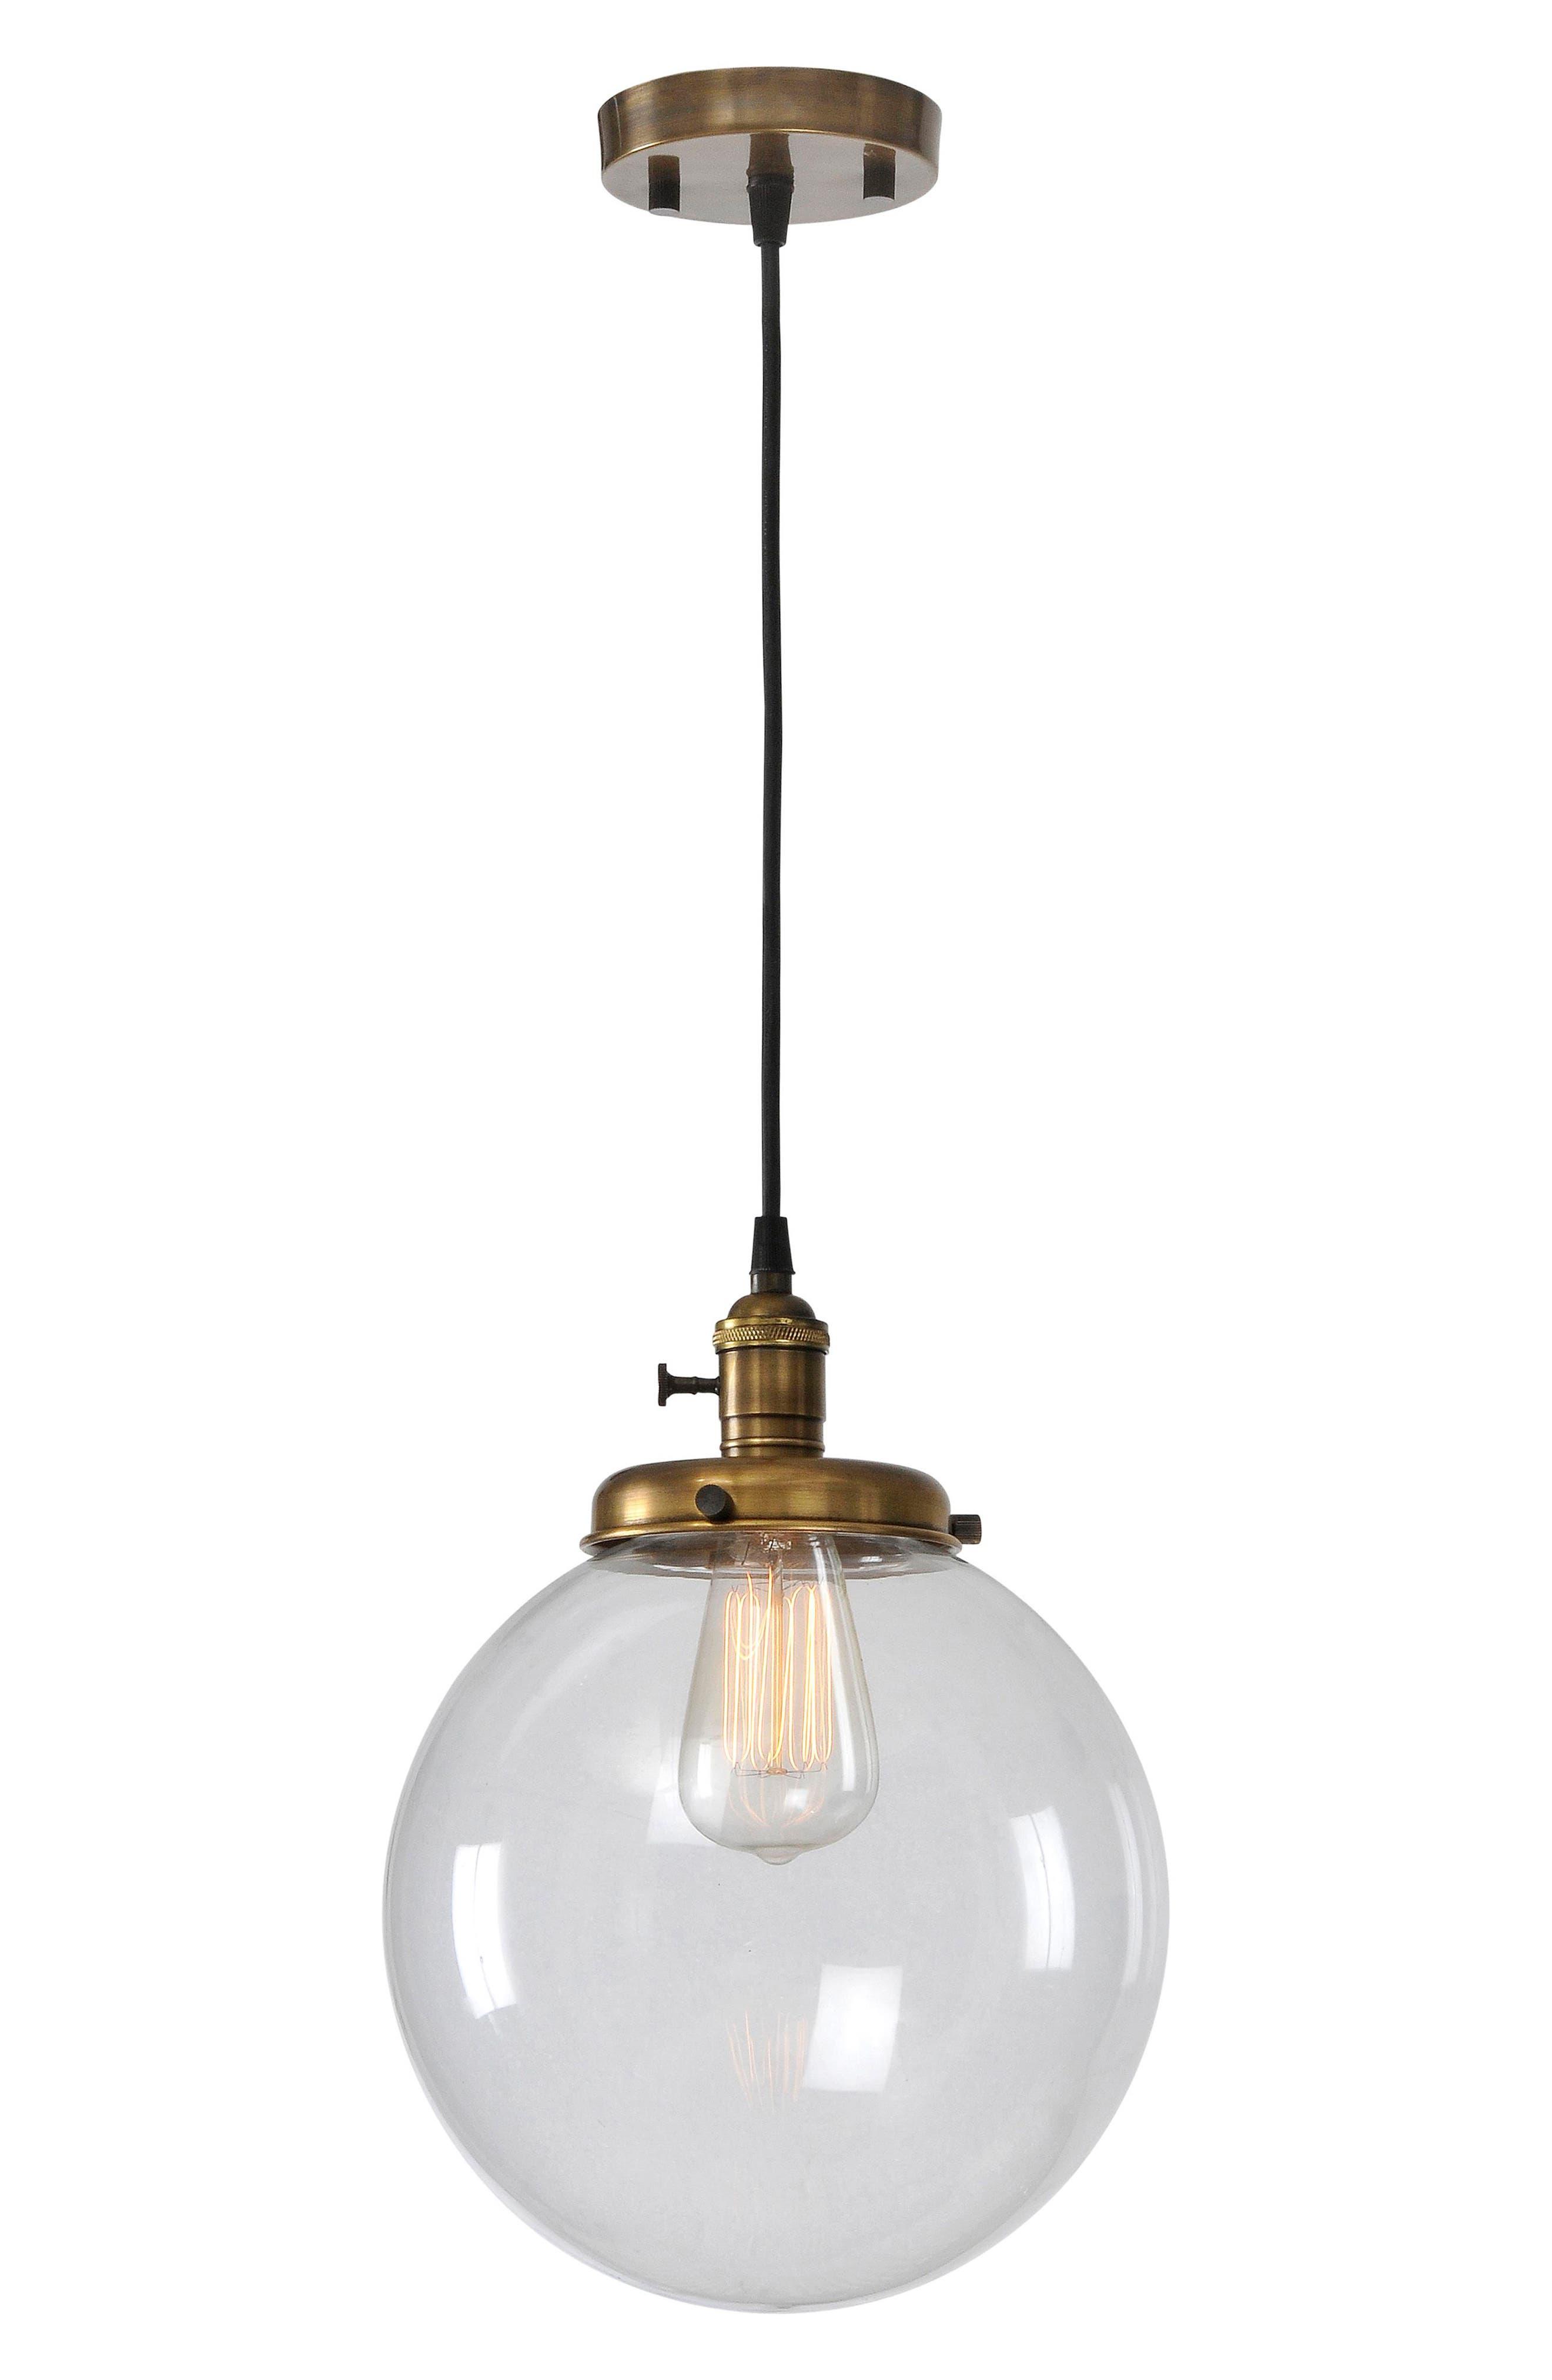 Main Image - Renwil Antonio Ceiling Light Fixture